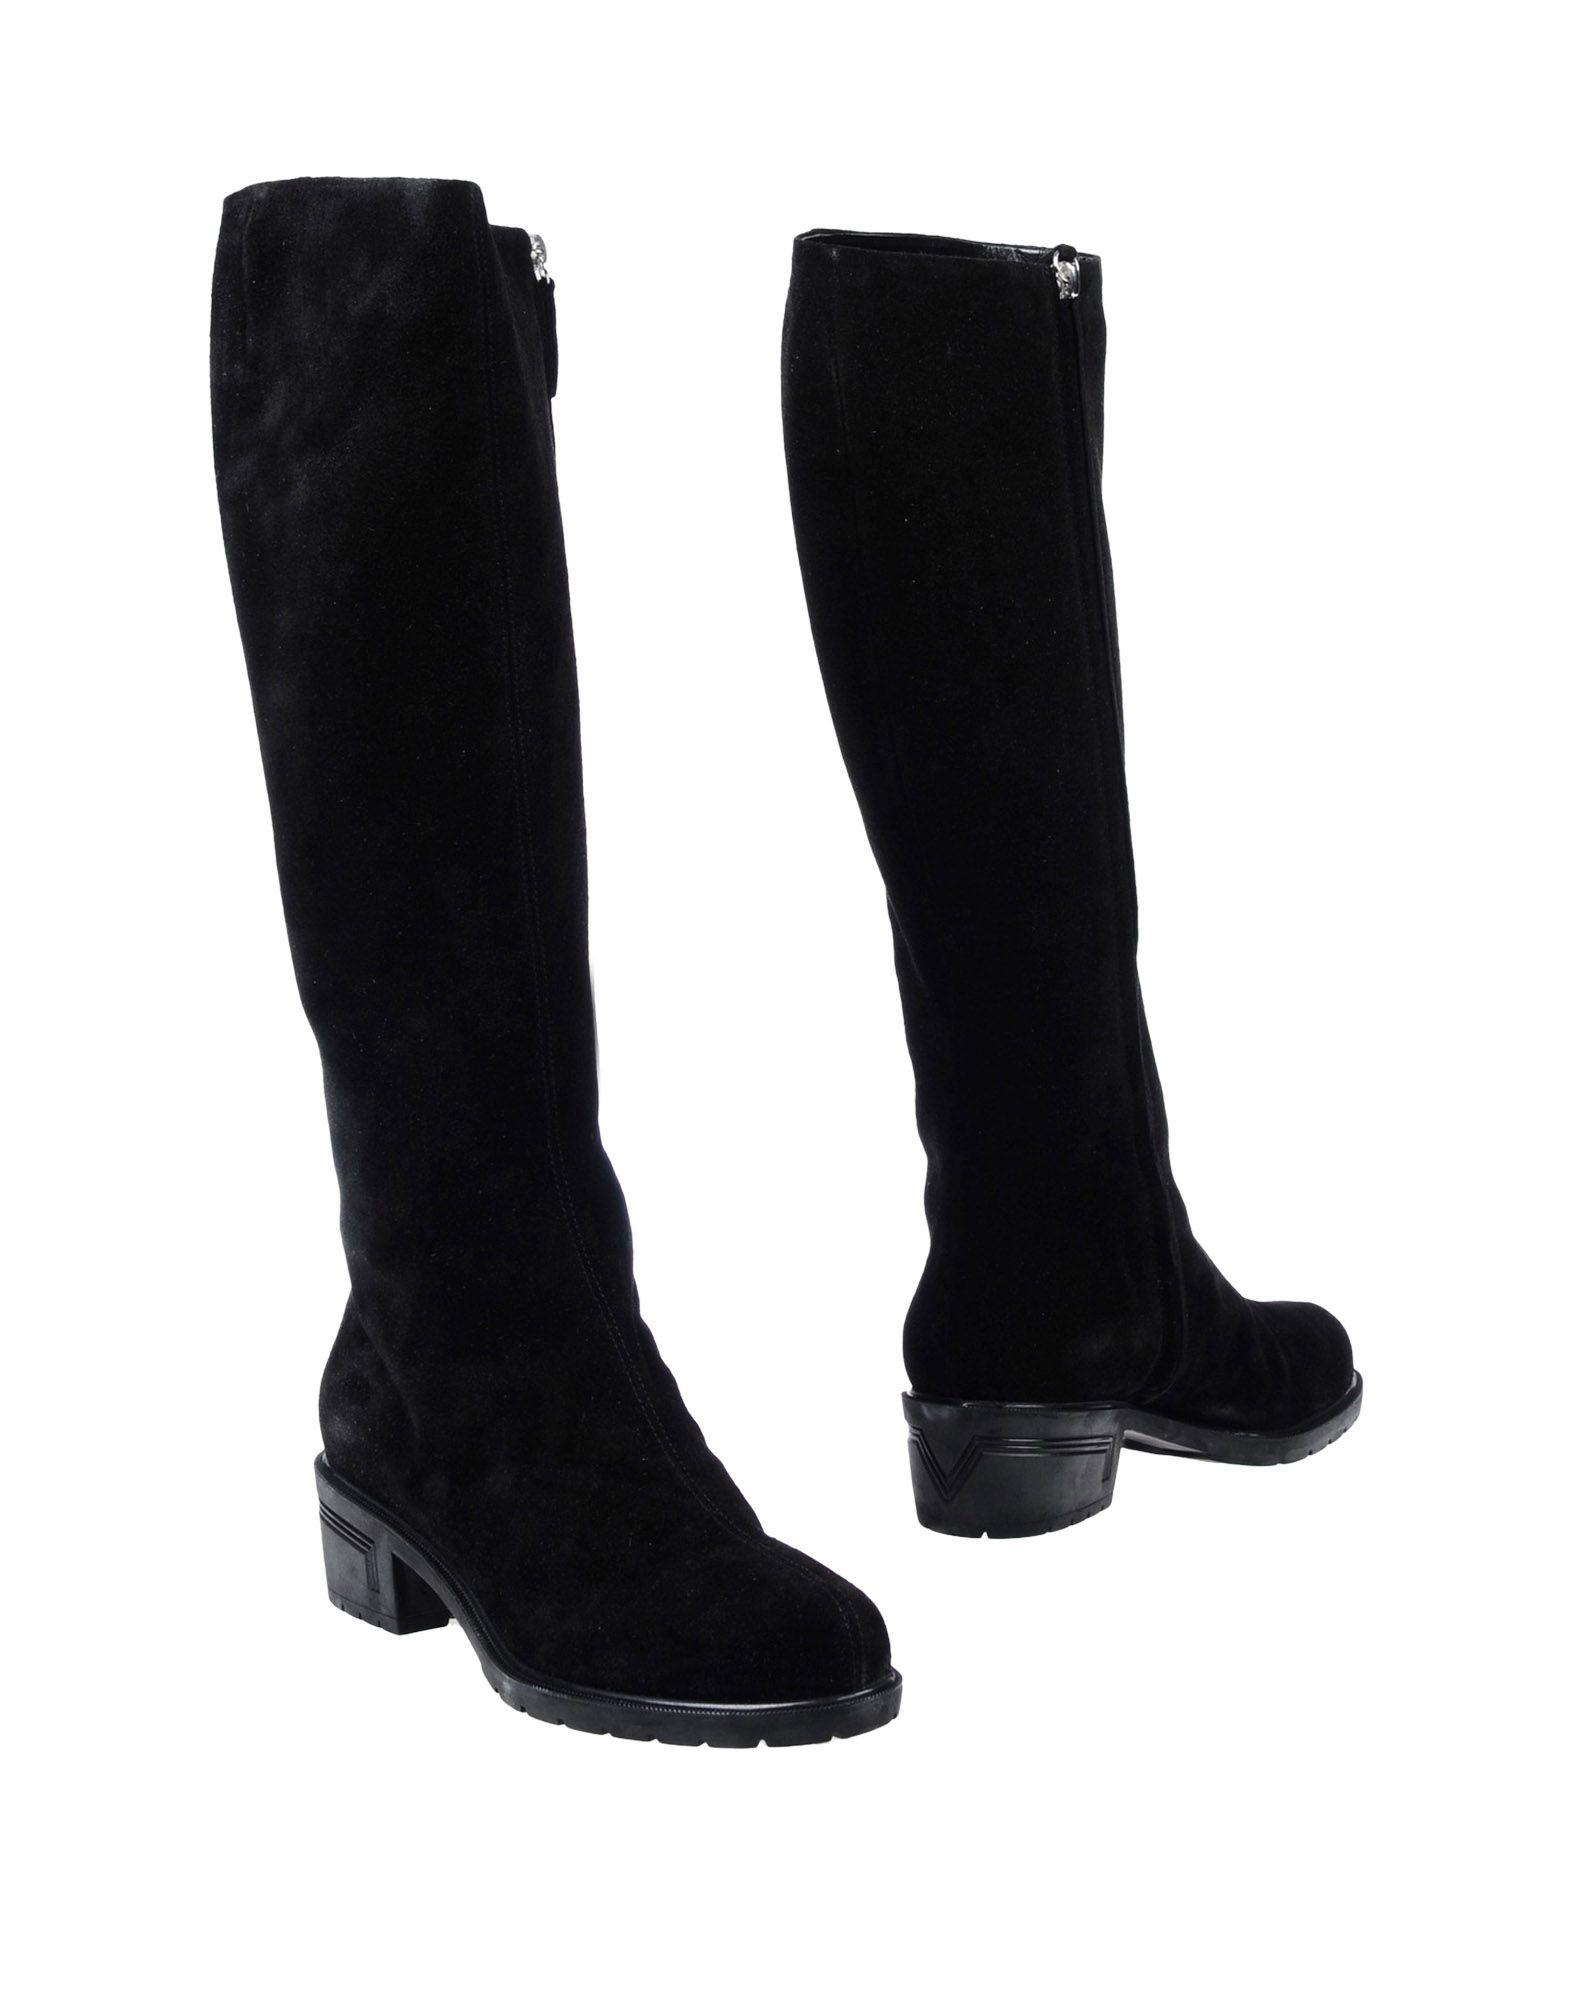 Giuseppe Zanotti Stiefel Damen Damen Stiefel  11414214KN Neue Schuhe c58233